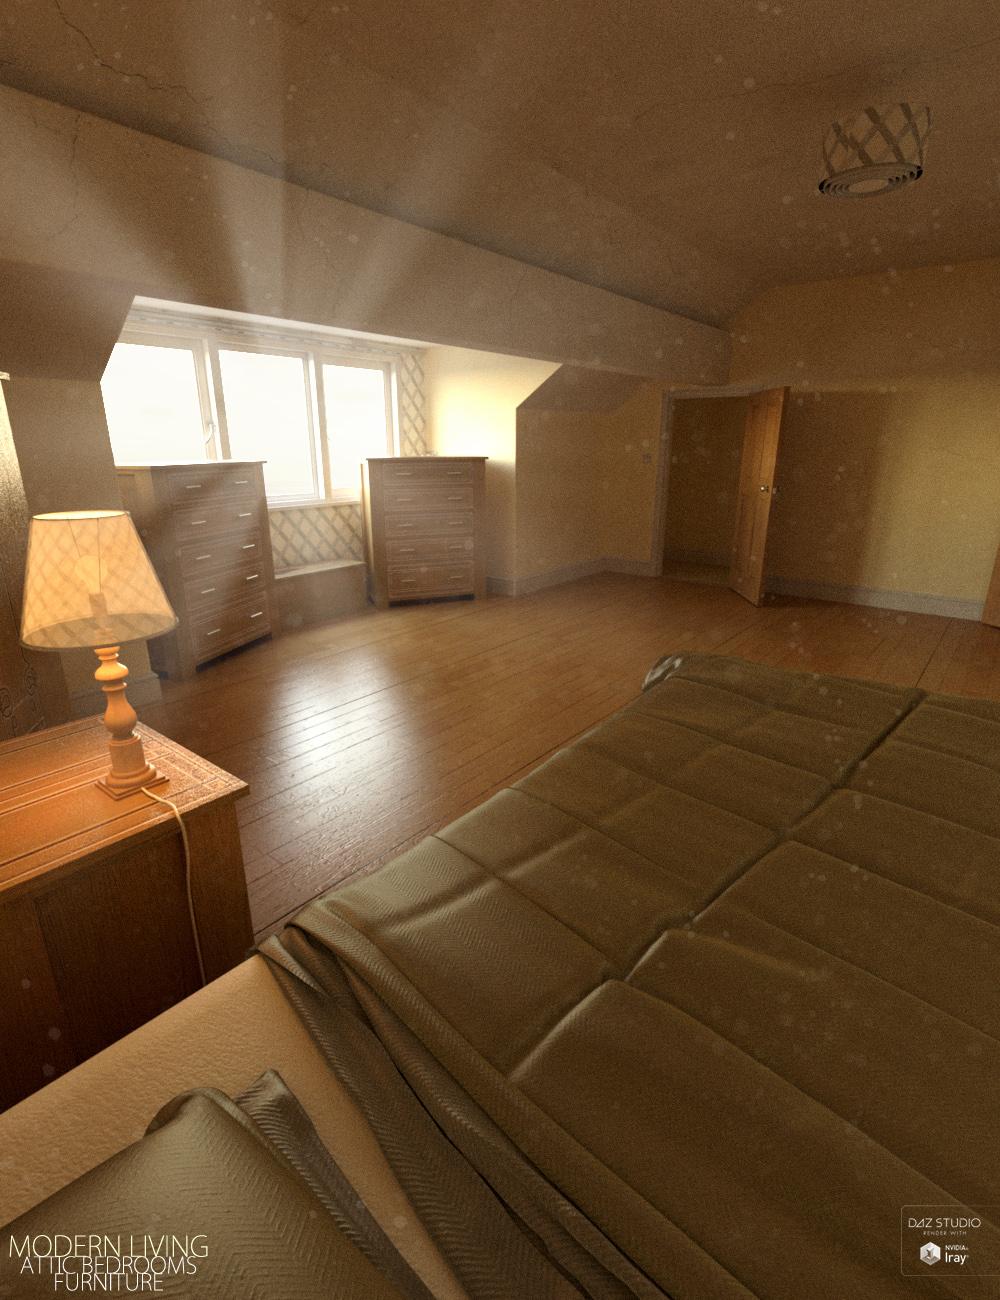 Modern Living Attic Bedroom Furniture by: David BrinnenForbiddenWhispers, 3D Models by Daz 3D